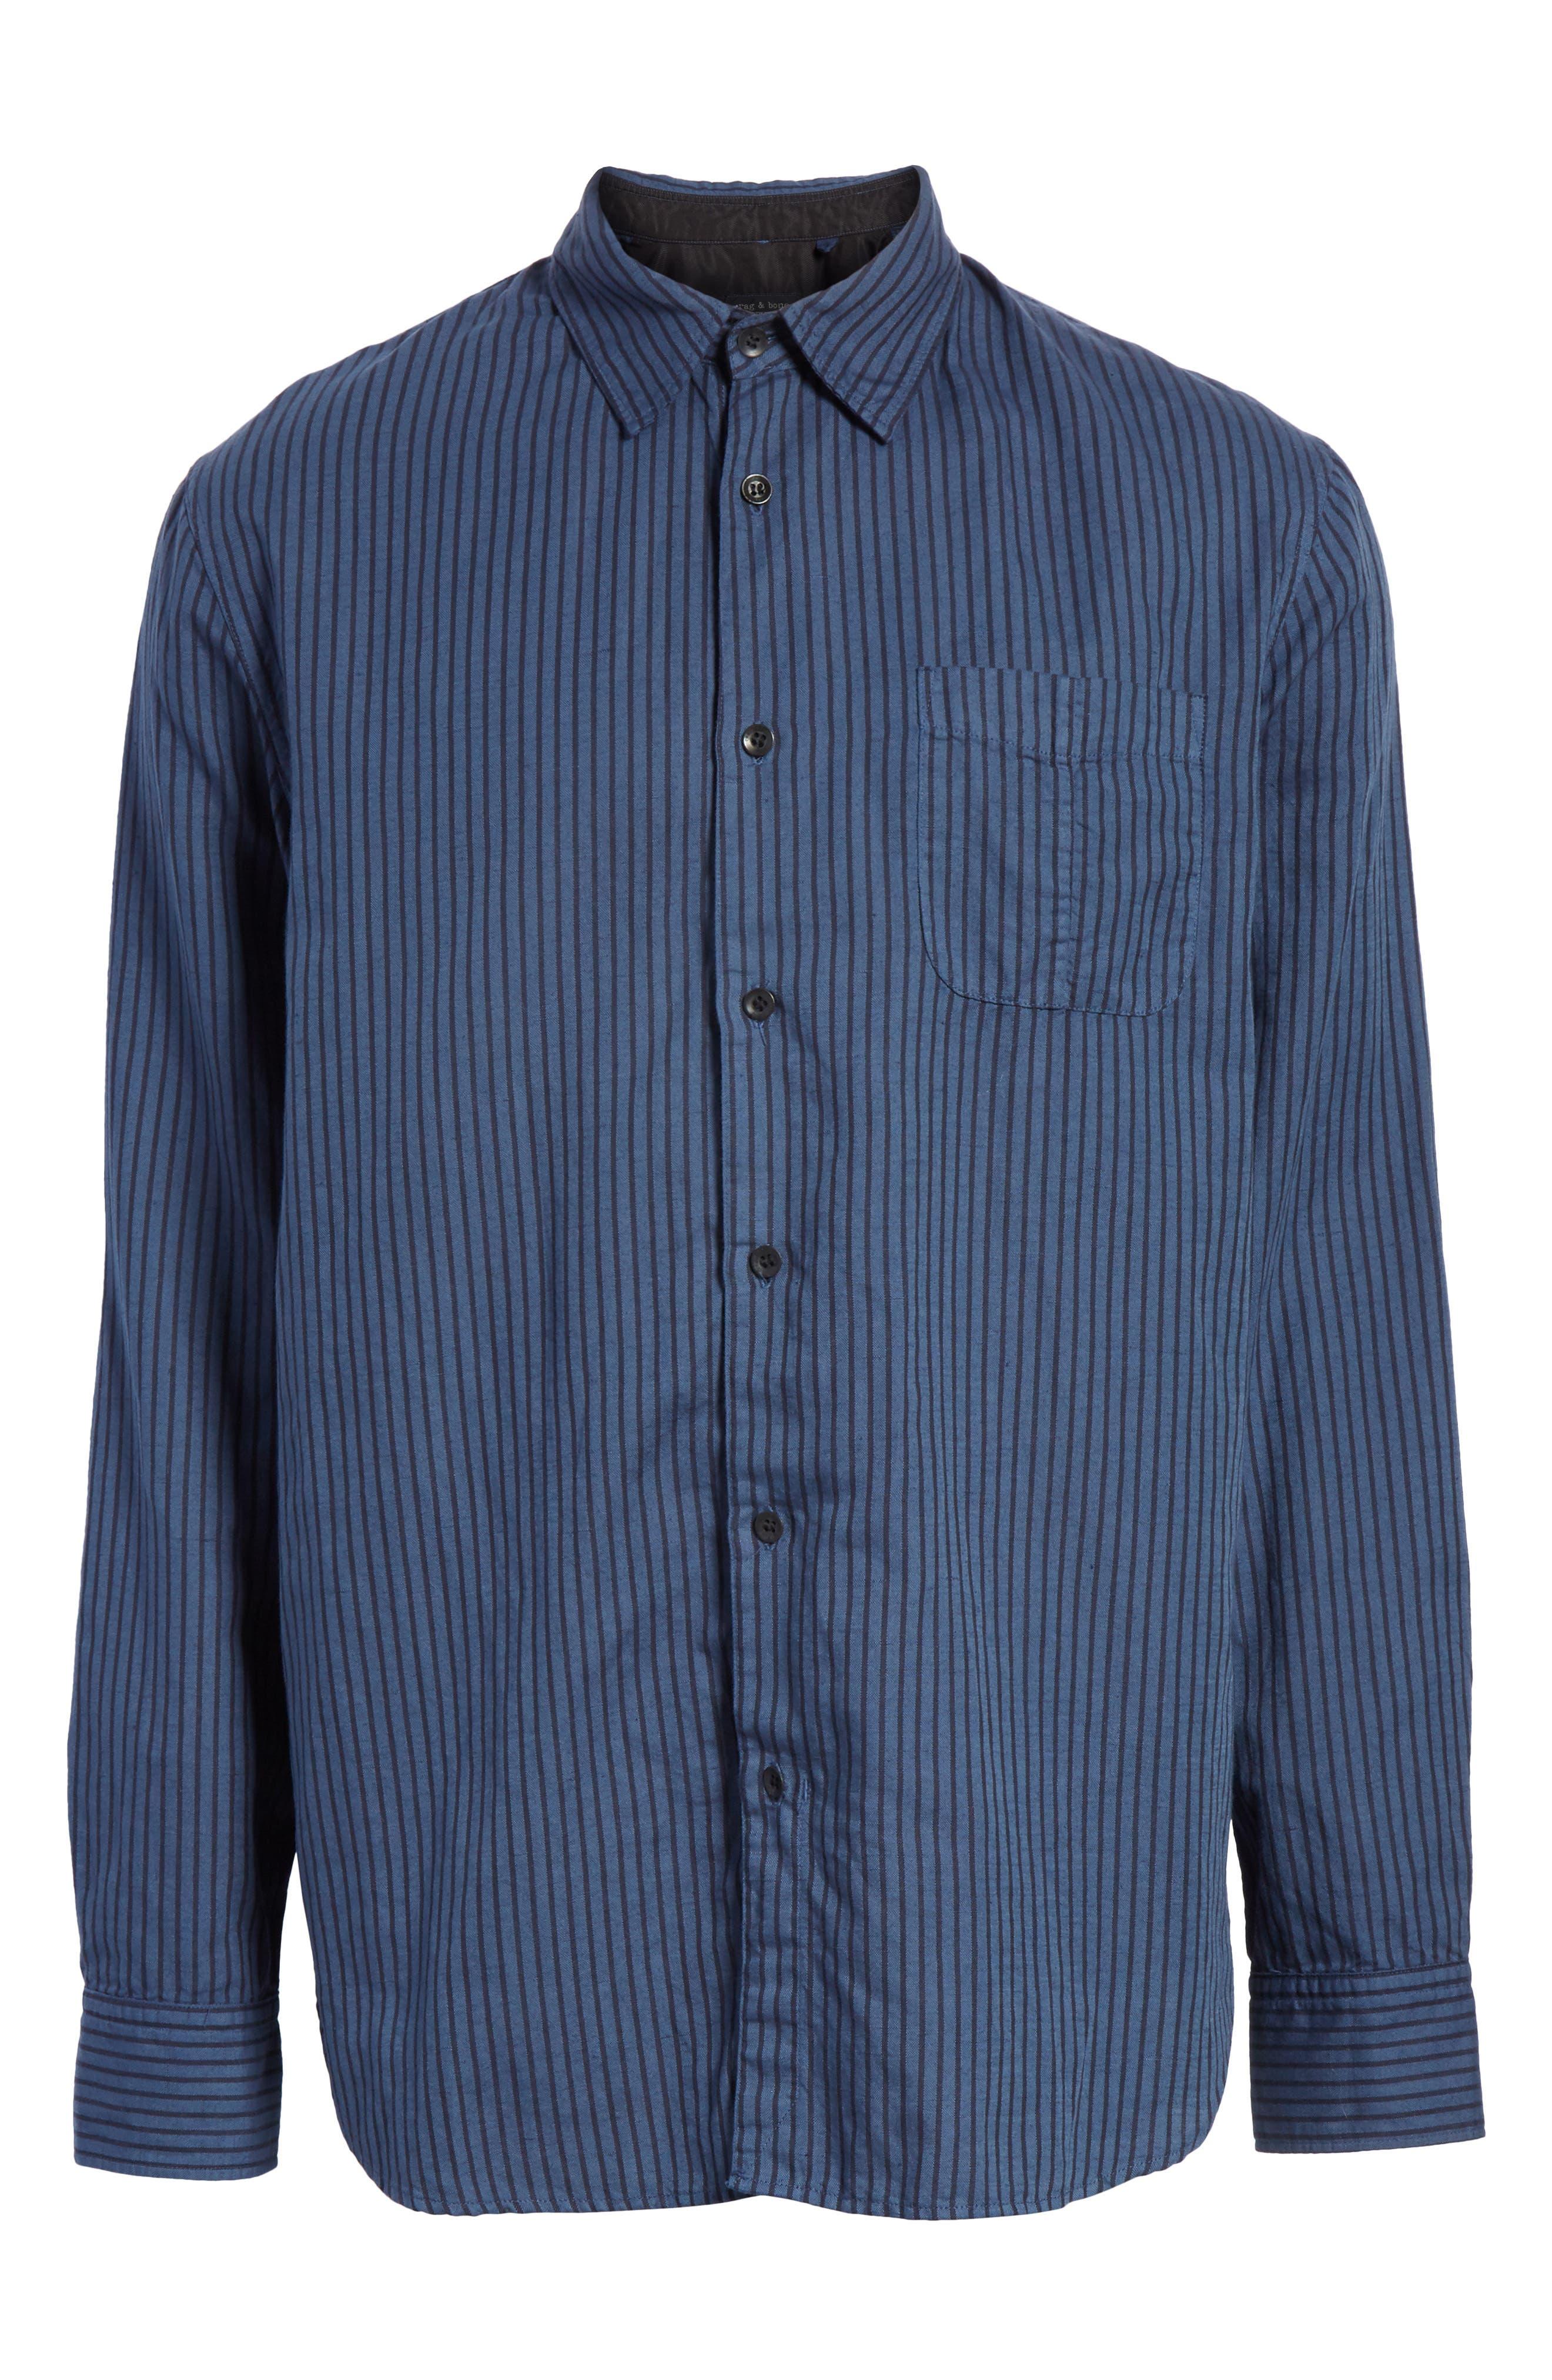 Beach Fit 3 Stripe Shirt,                             Alternate thumbnail 6, color,